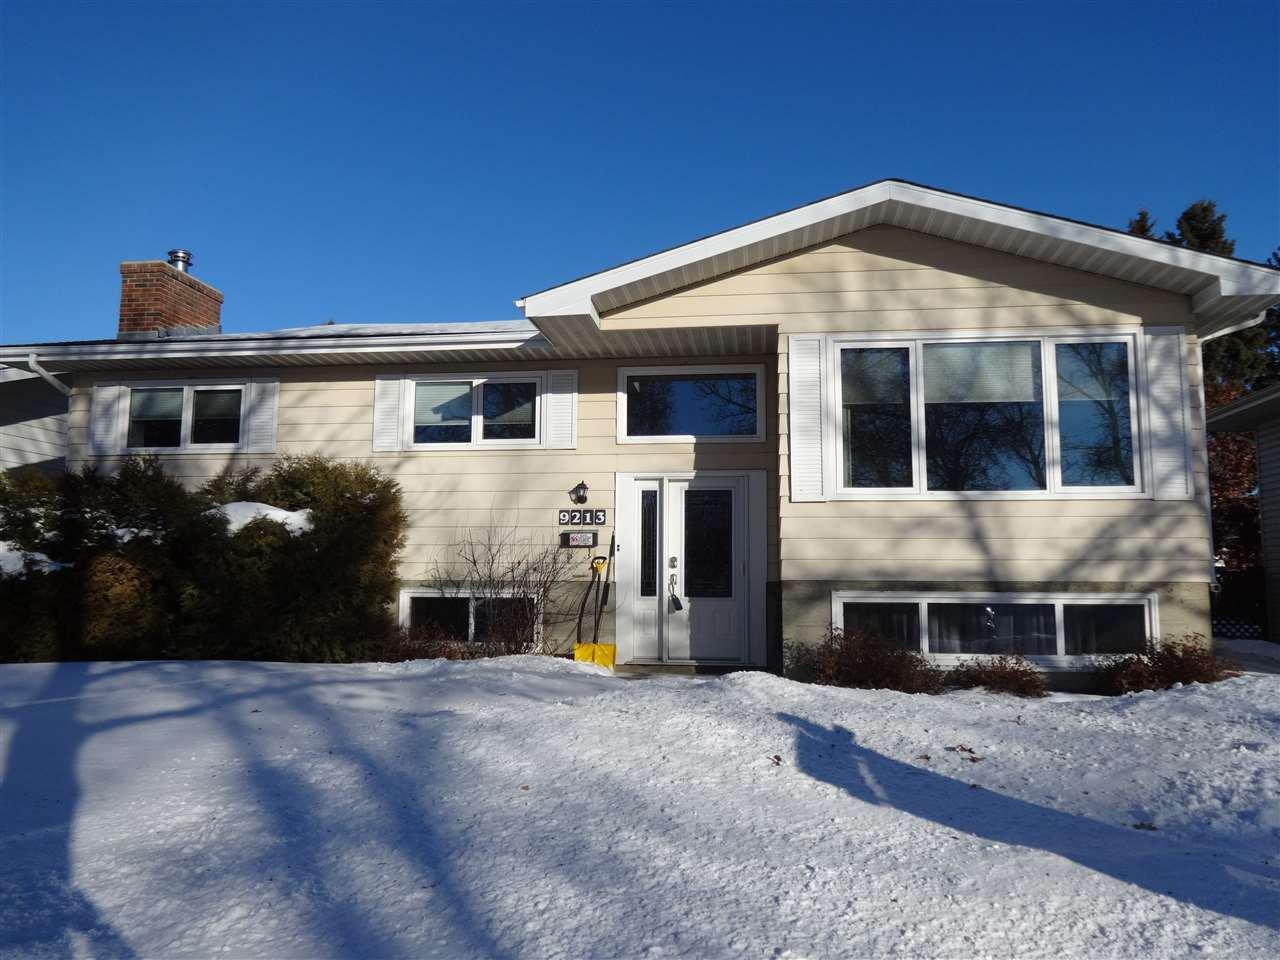 Main Photo: 9213 87 Street: Fort Saskatchewan House for sale : MLS®# E4224980